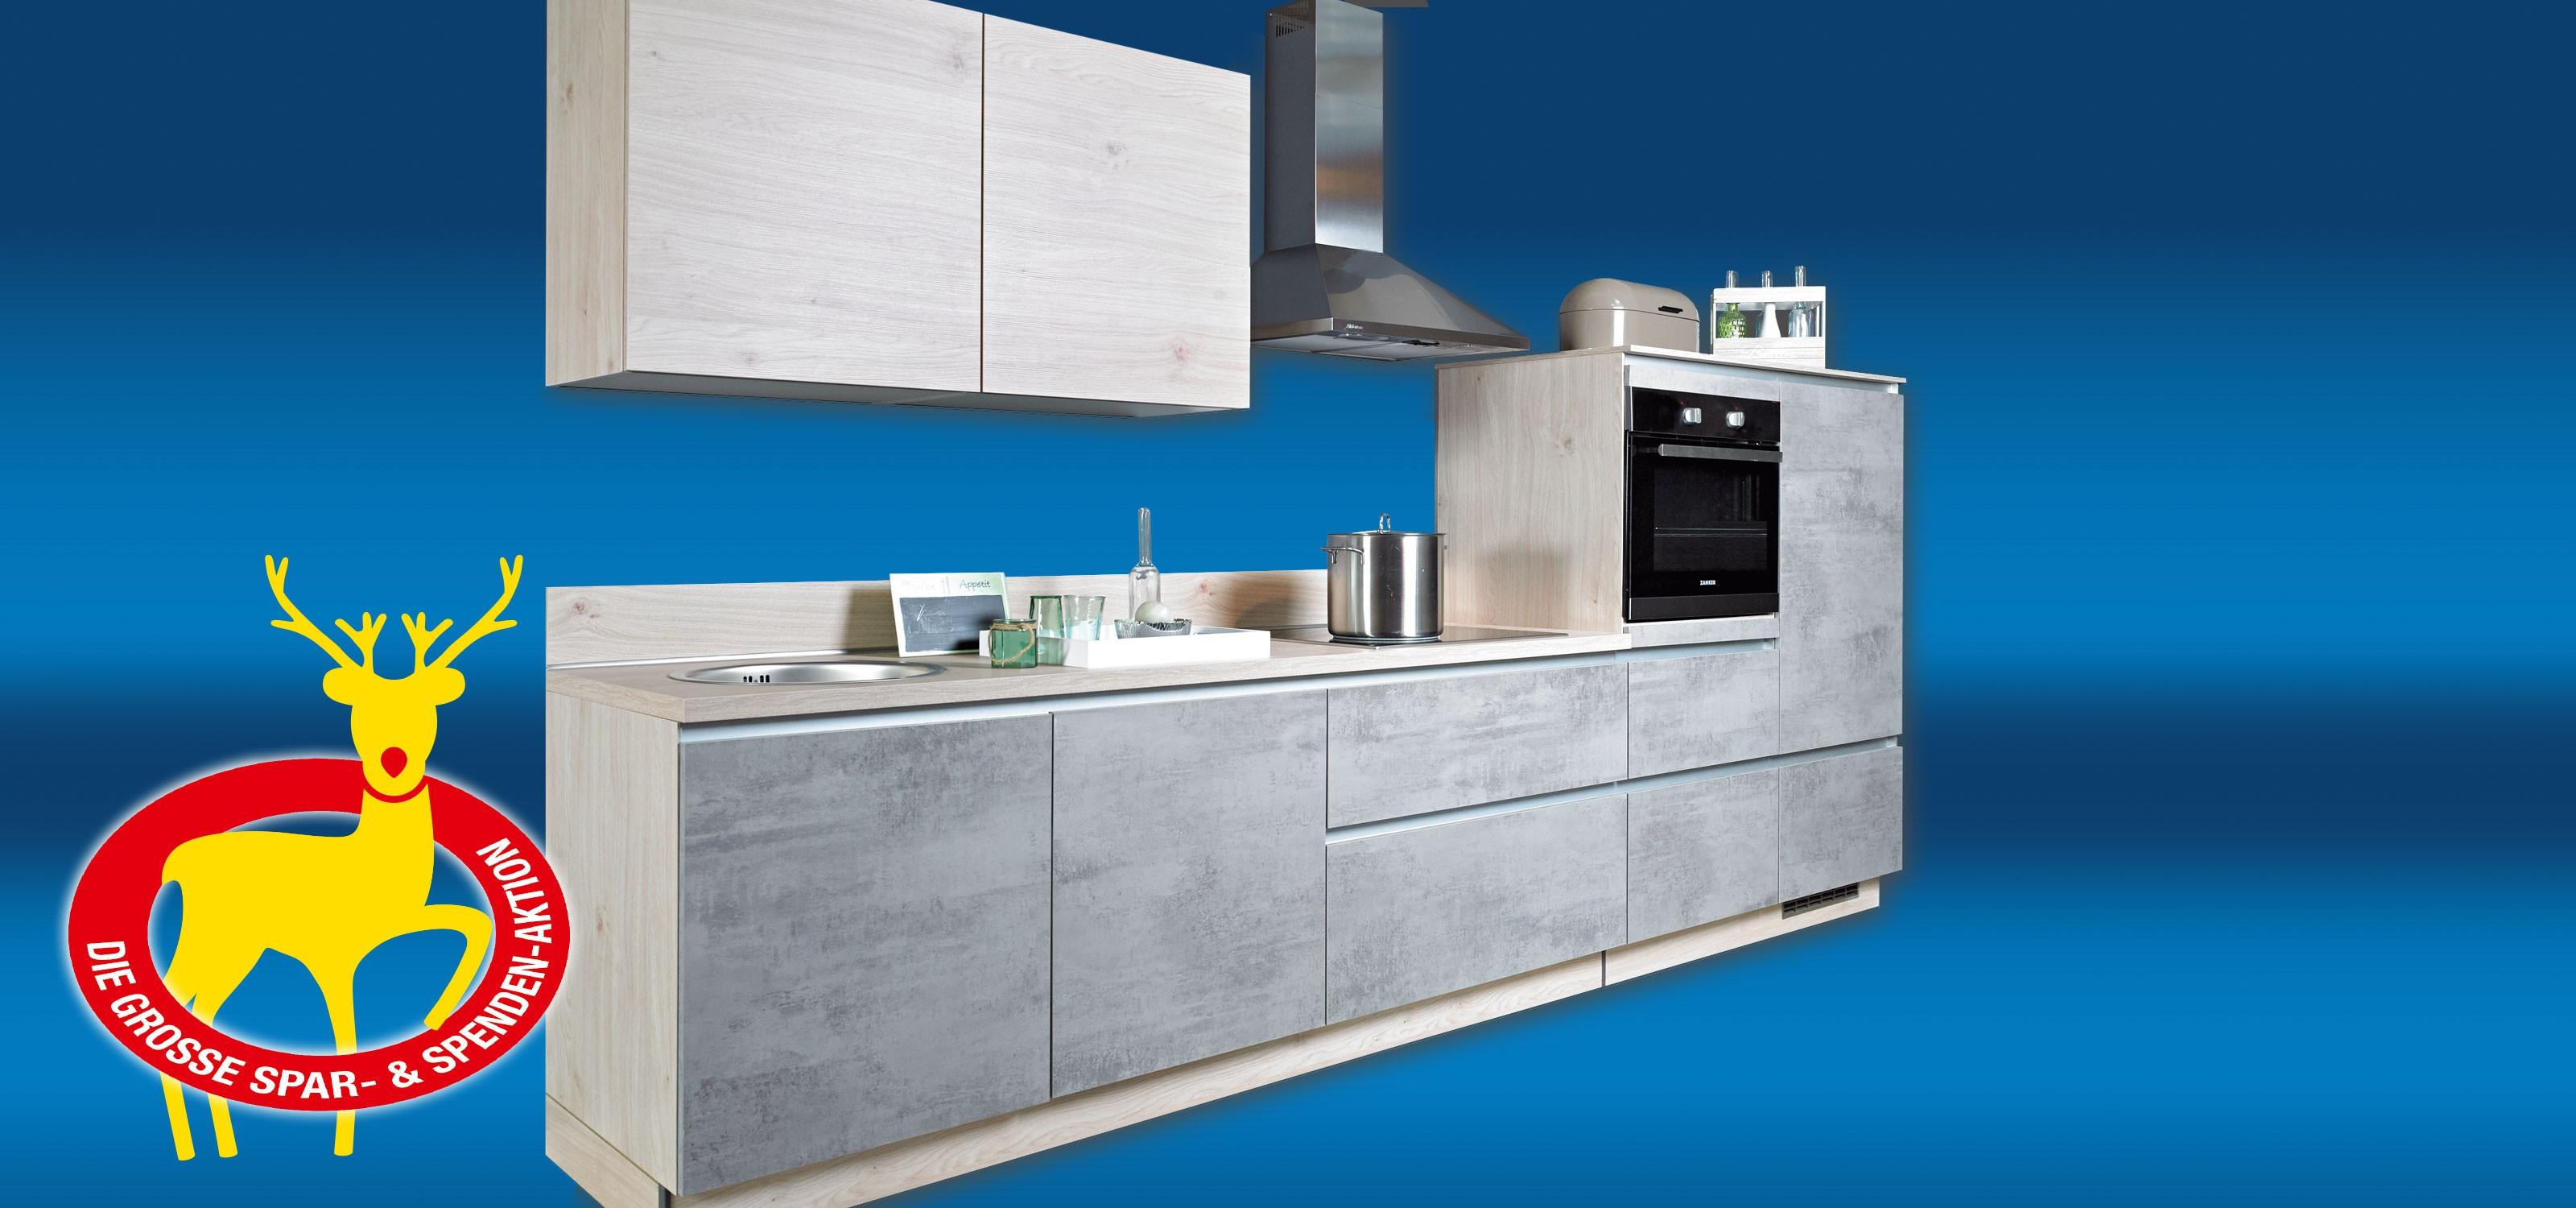 Einbauküche Beton